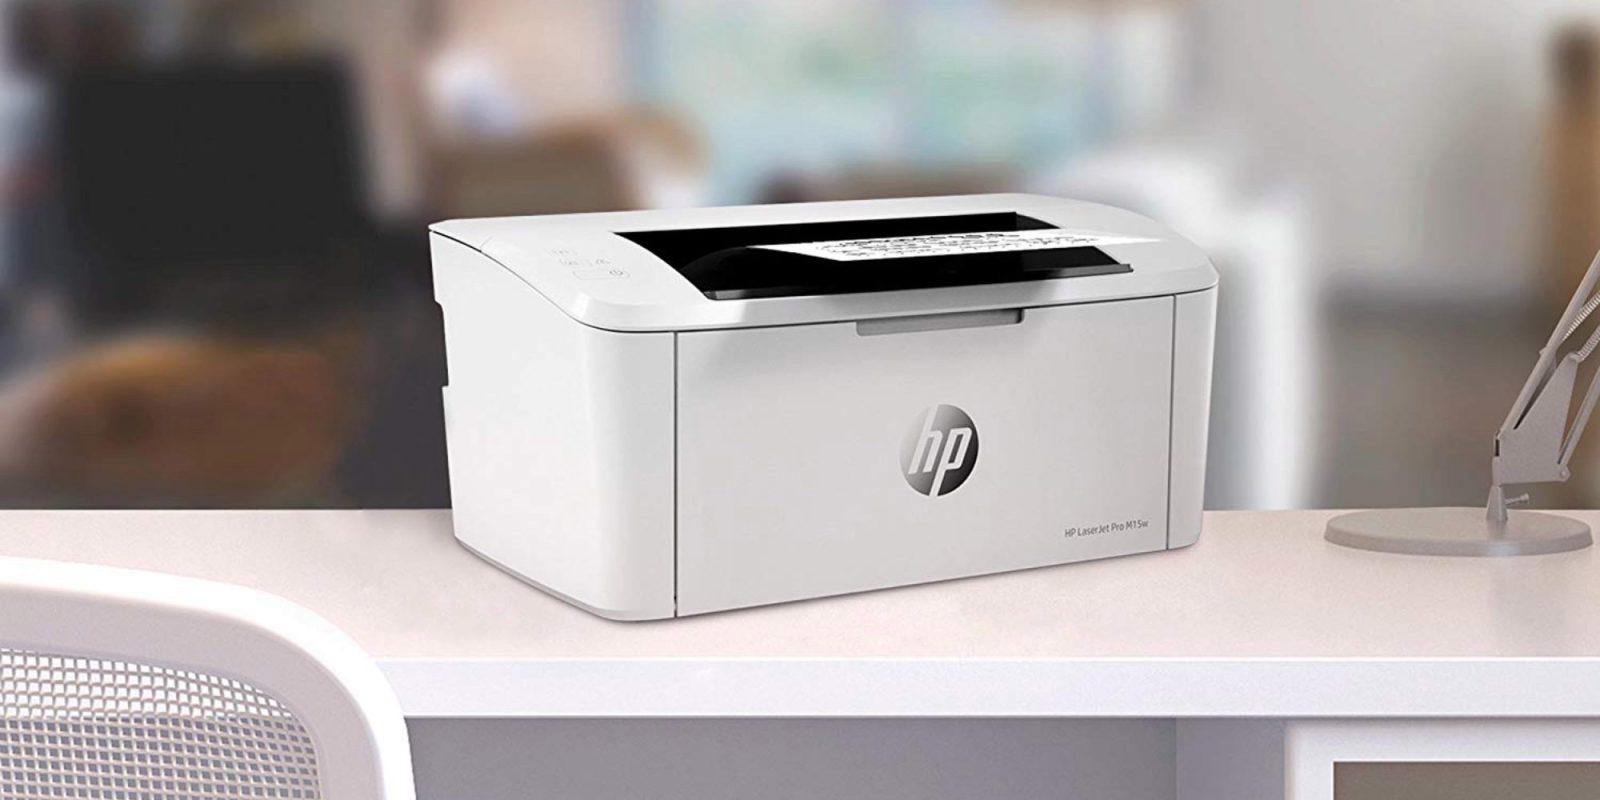 HP LaserJet Pro M15w: valida alternativa